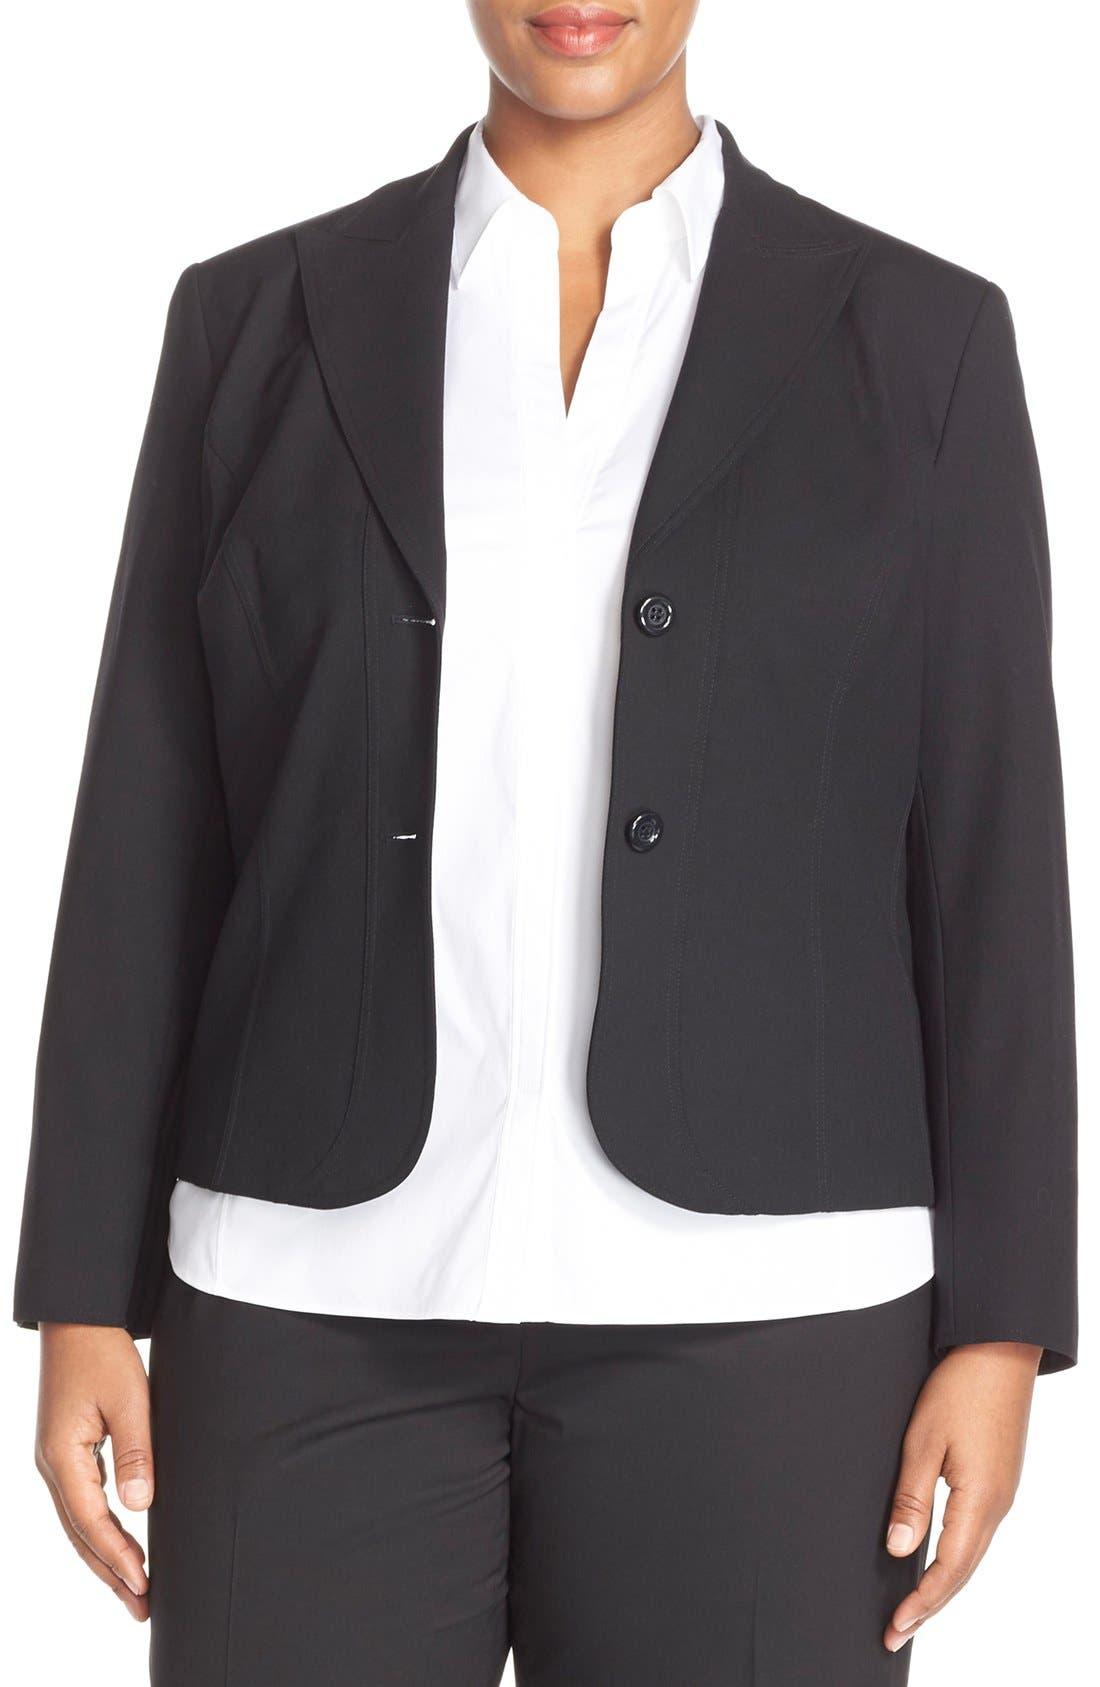 'Gladstone' Stretch Wool Jacket,                             Main thumbnail 1, color,                             Black